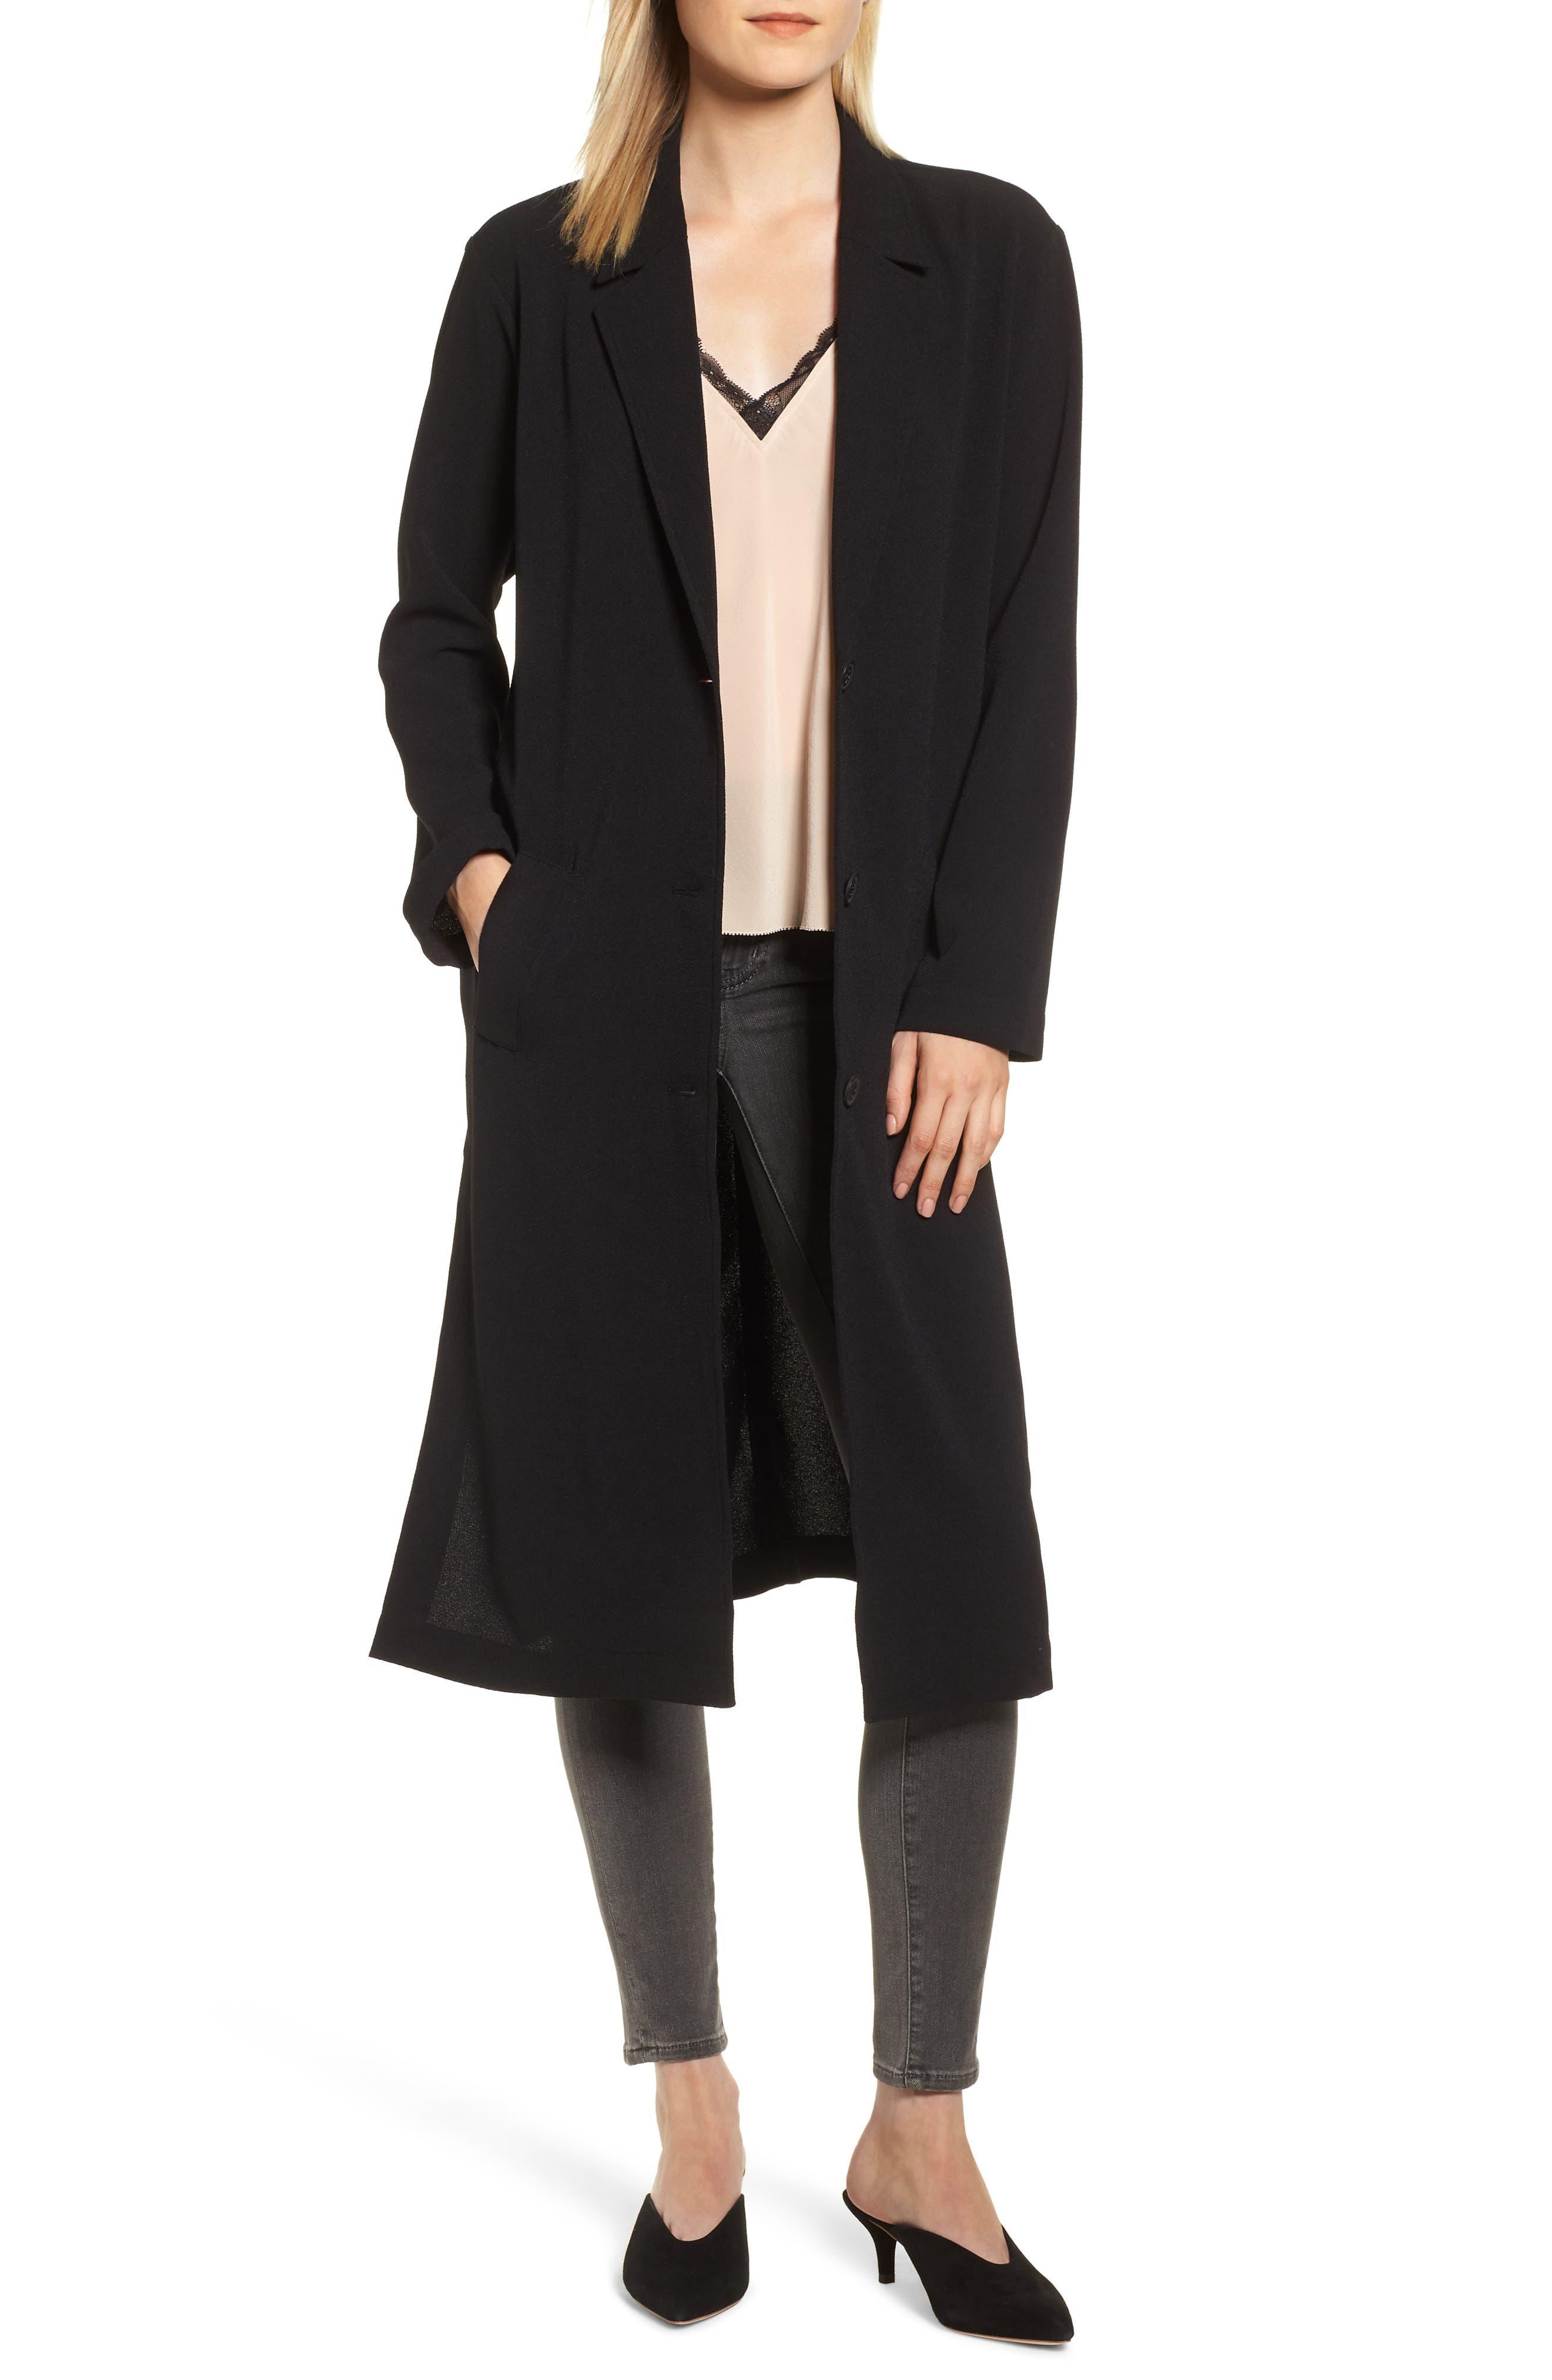 1920s Coats, Flapper Coats, 20s Jackets Womens Chelsea28 Duster Jacket $59.40 AT vintagedancer.com